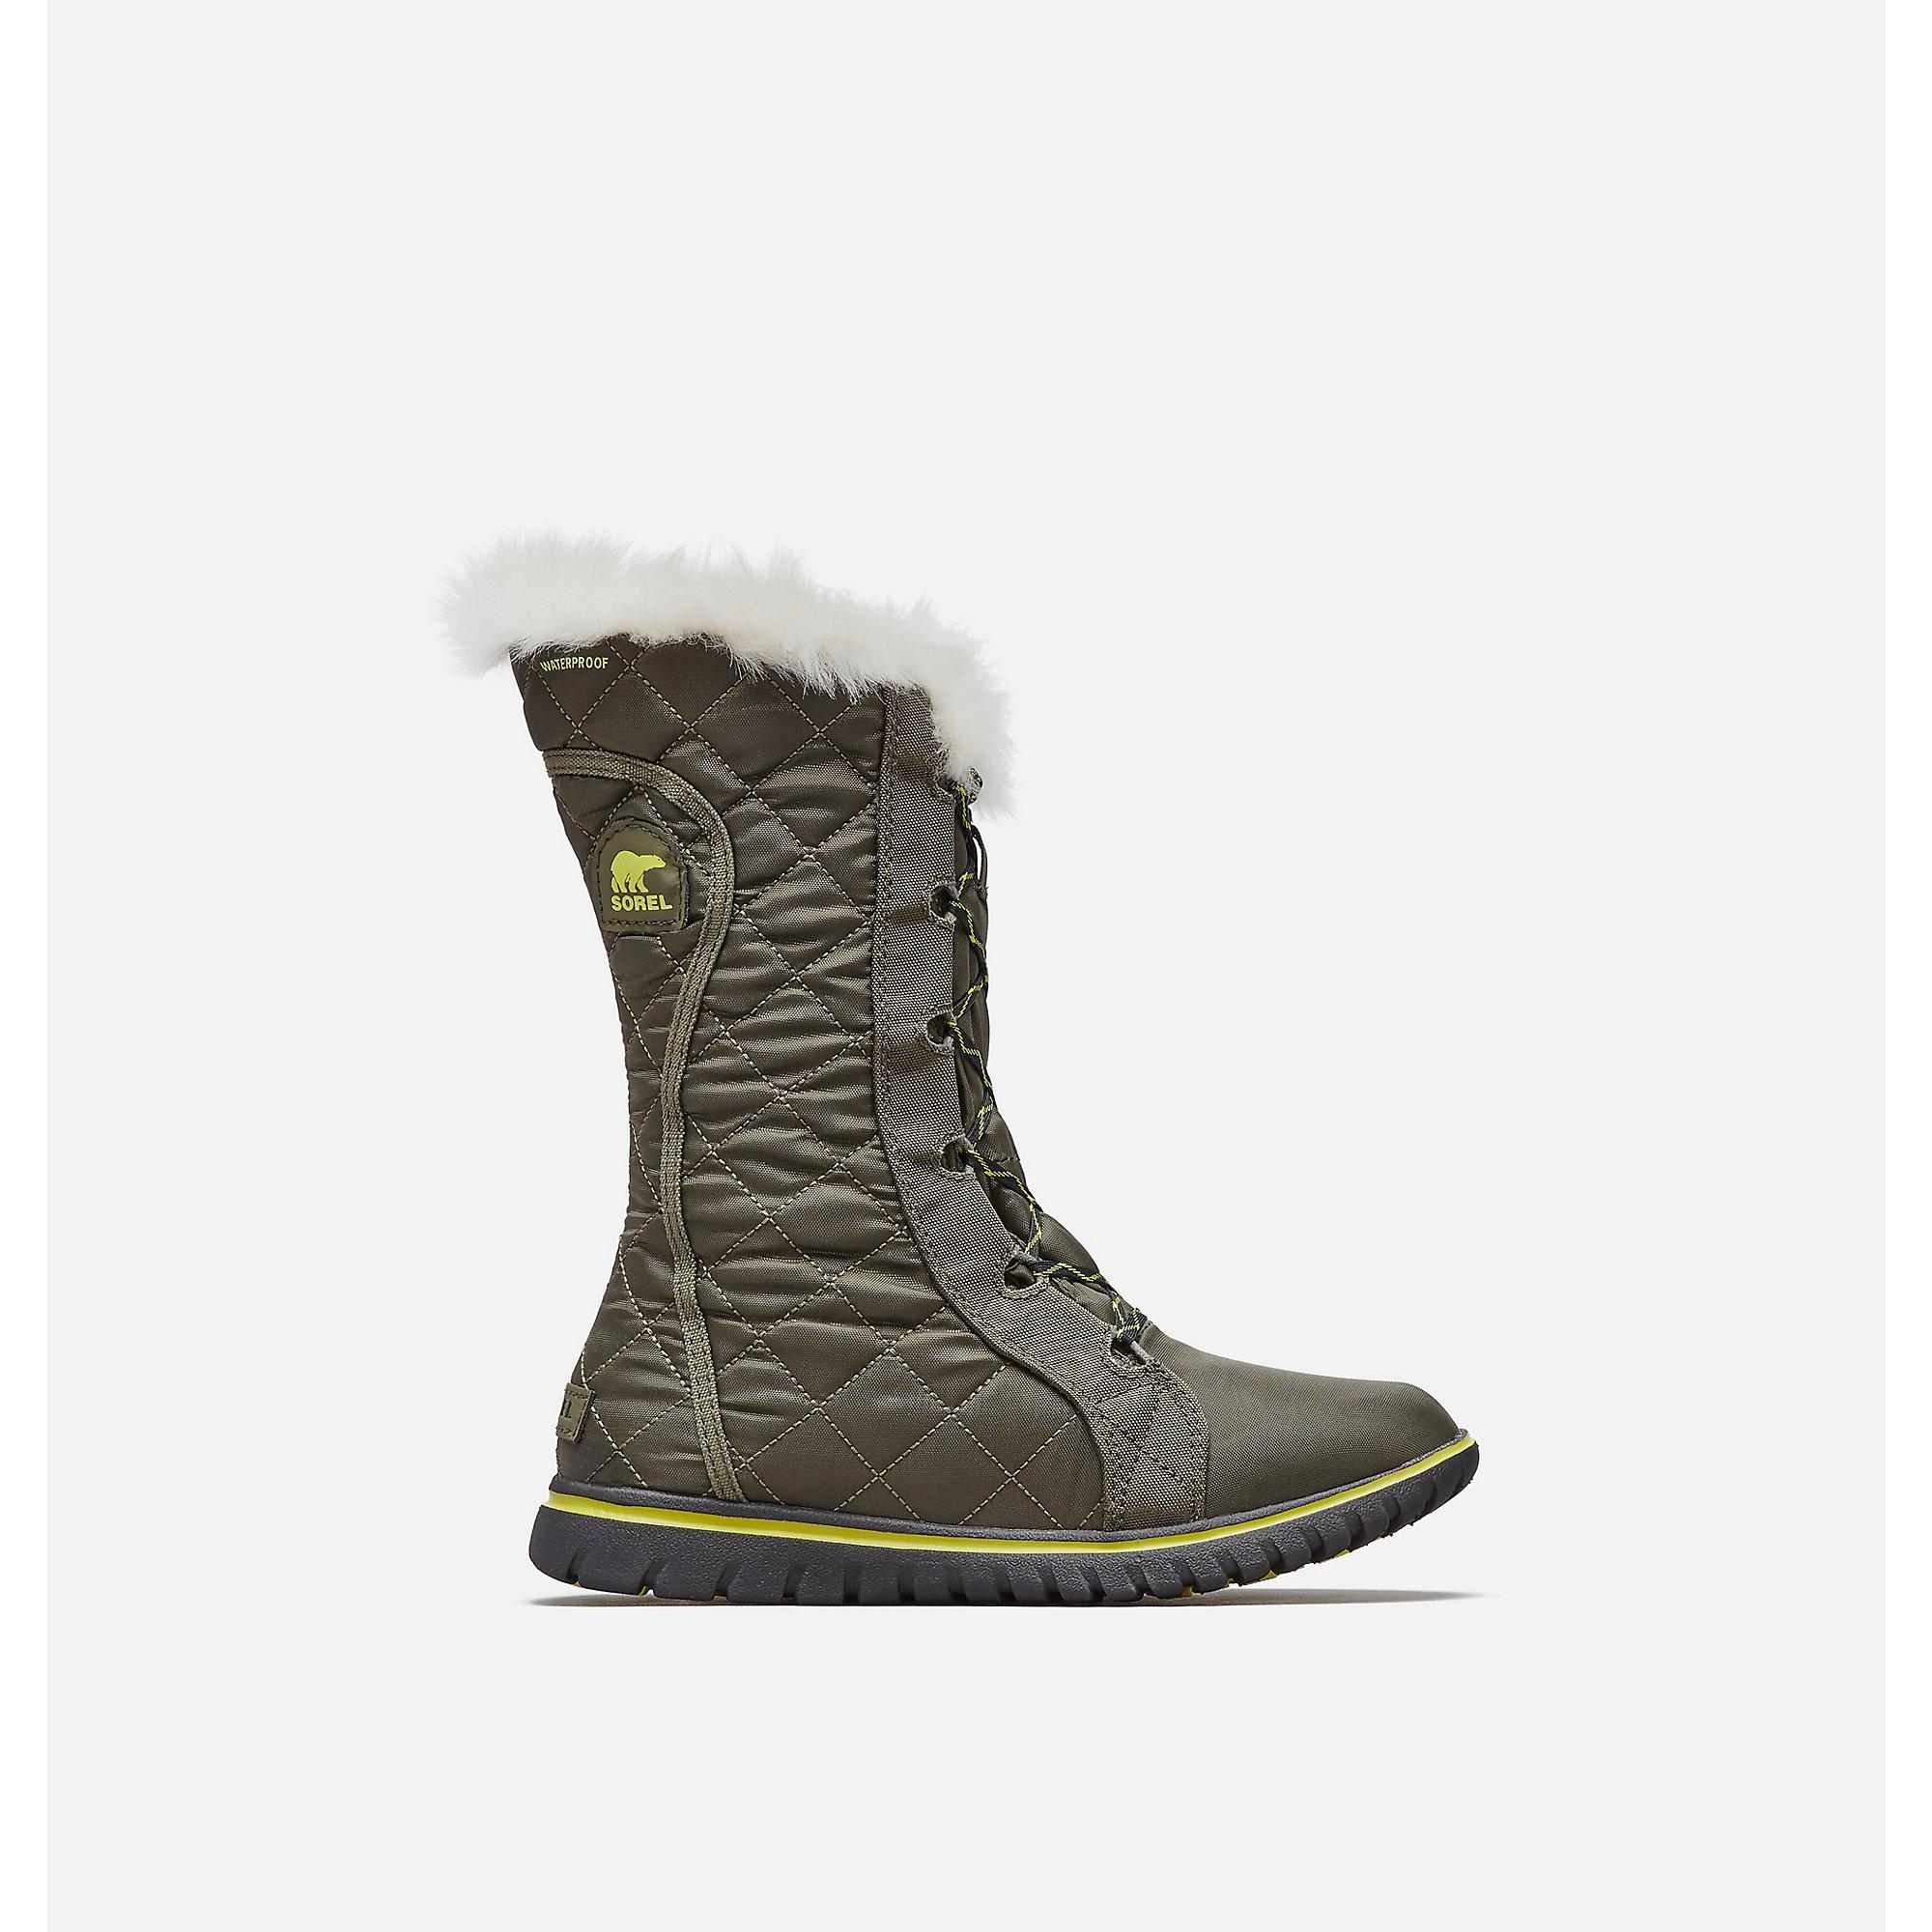 Discount coupons sorel boots